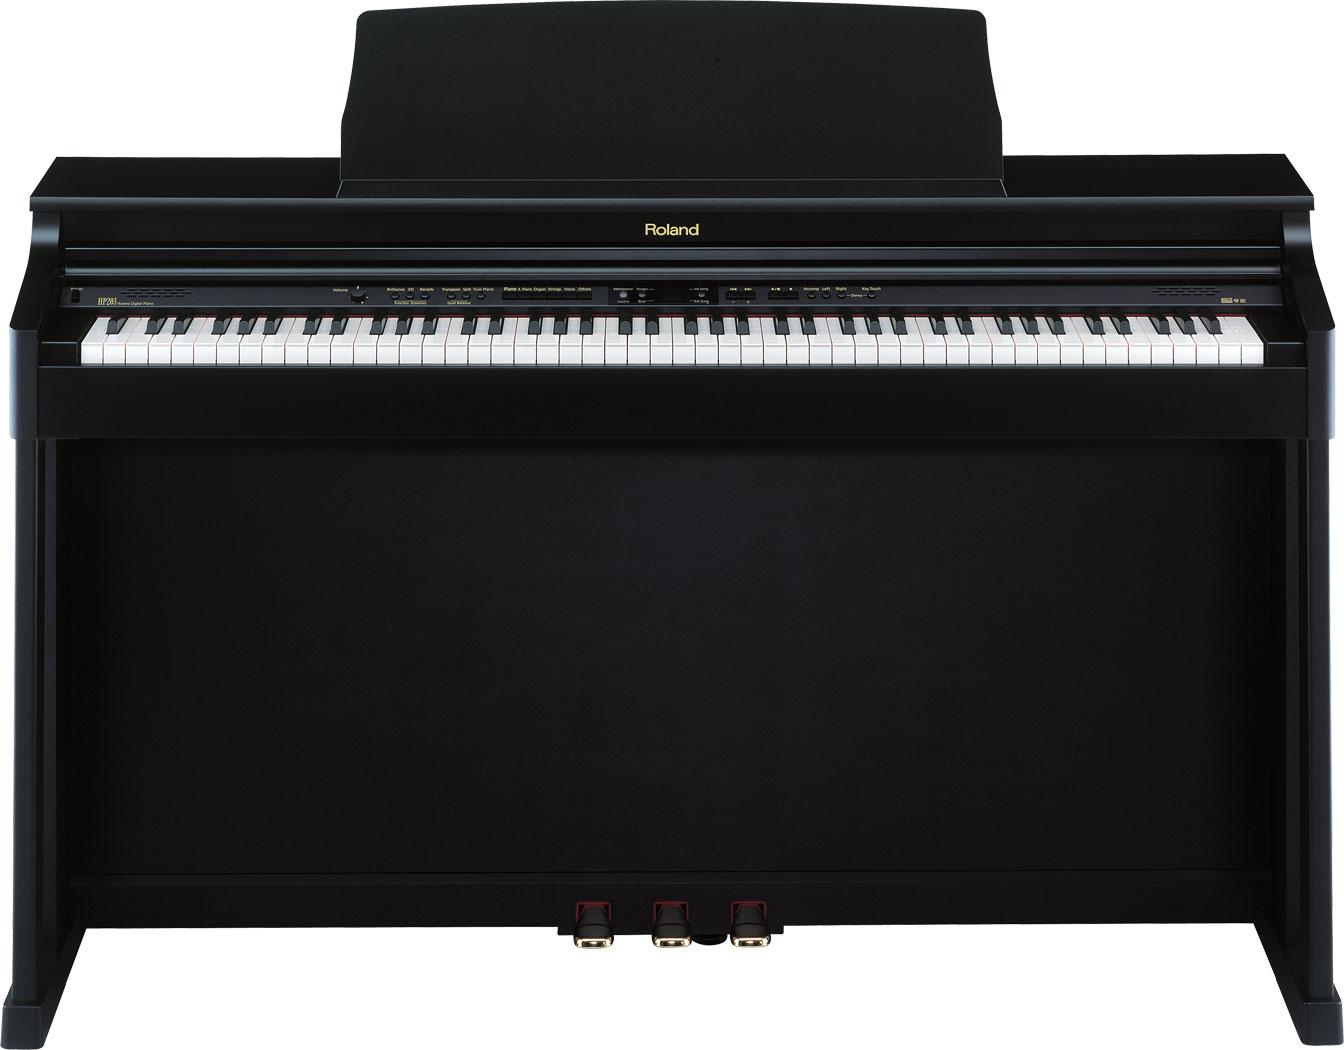 roland hp 203 digital piano. Black Bedroom Furniture Sets. Home Design Ideas